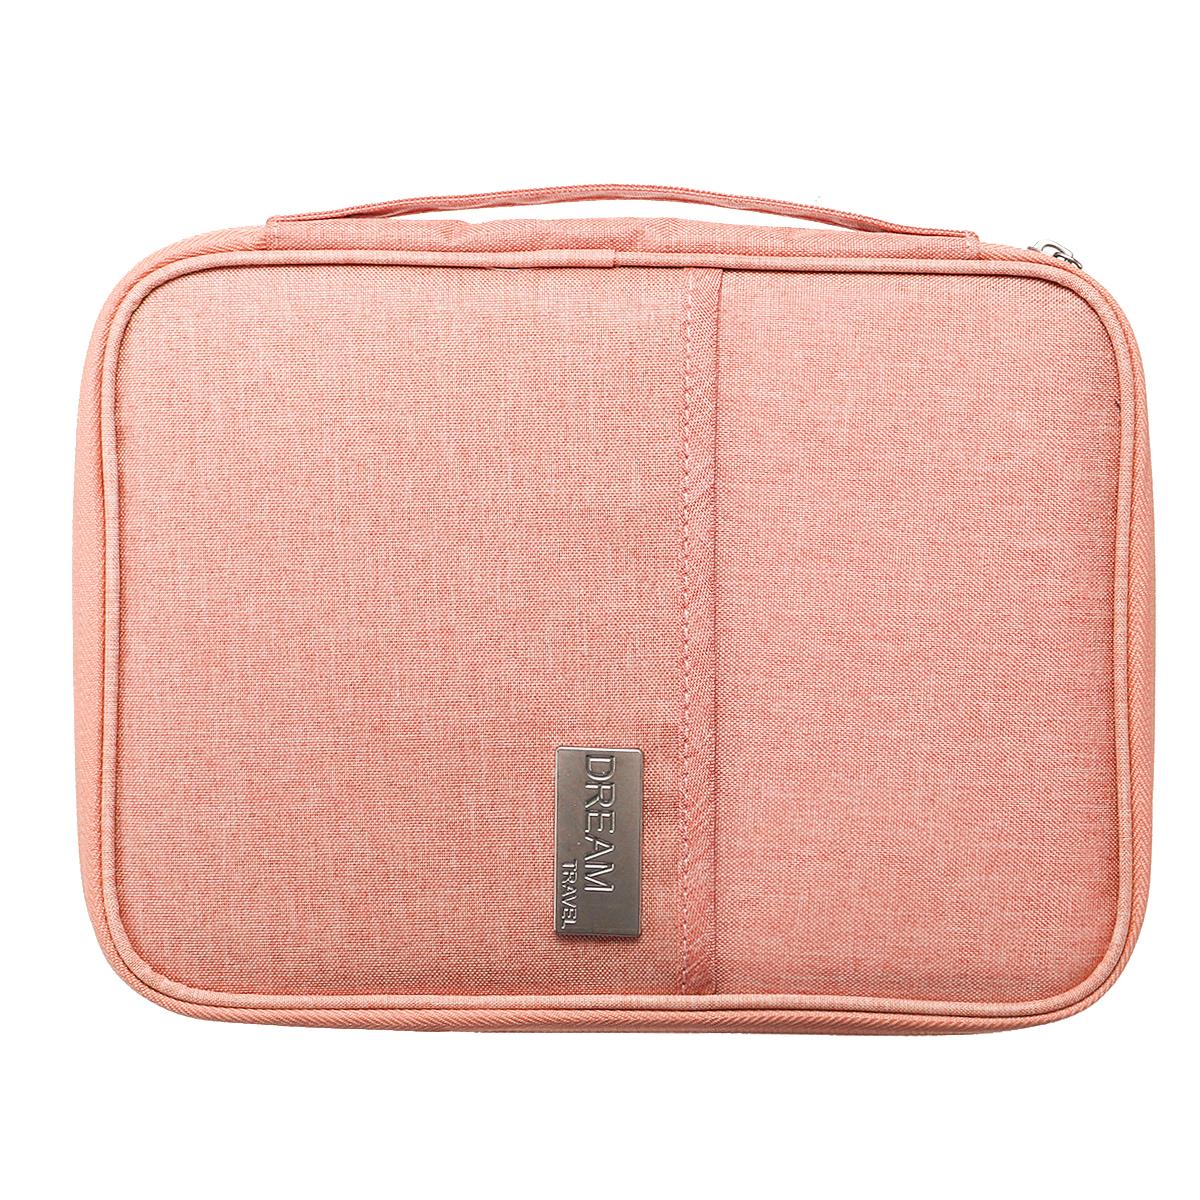 Waterproof Oxford Bag Multifunctional Storage Bag Wallet Outdoor Sports Camping Travel Hiking Bag